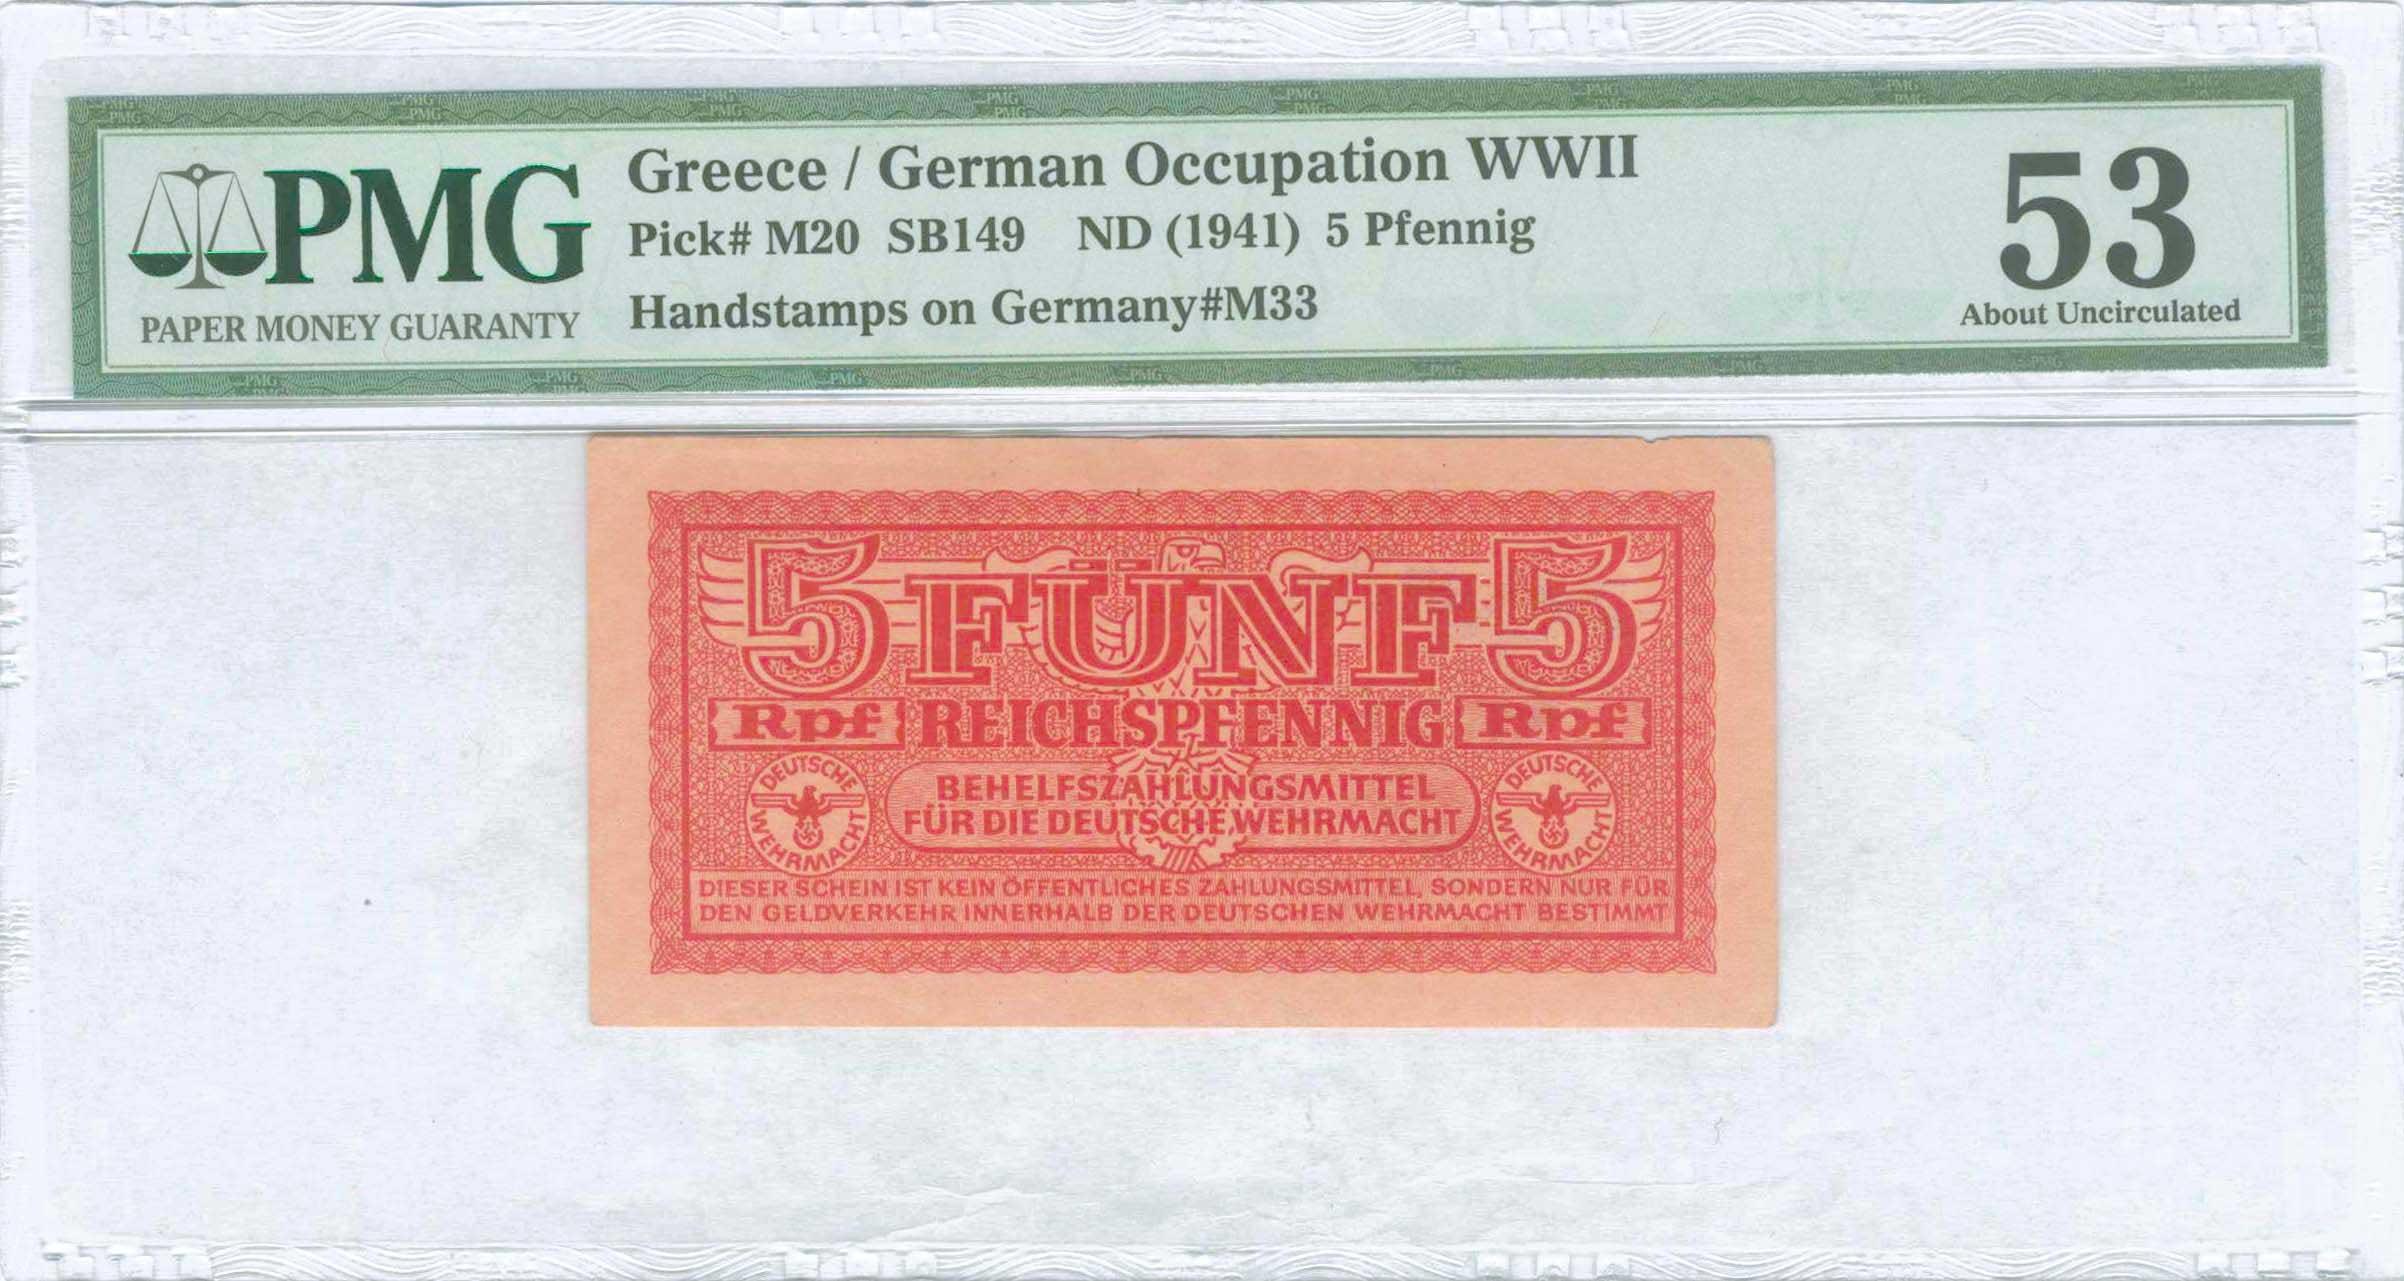 Lot 6516 - -  PAPER MONEY - BANKNOTES german occupation -  A. Karamitsos Public & Live Internet Auction 665 Coins, Medals & Banknotes